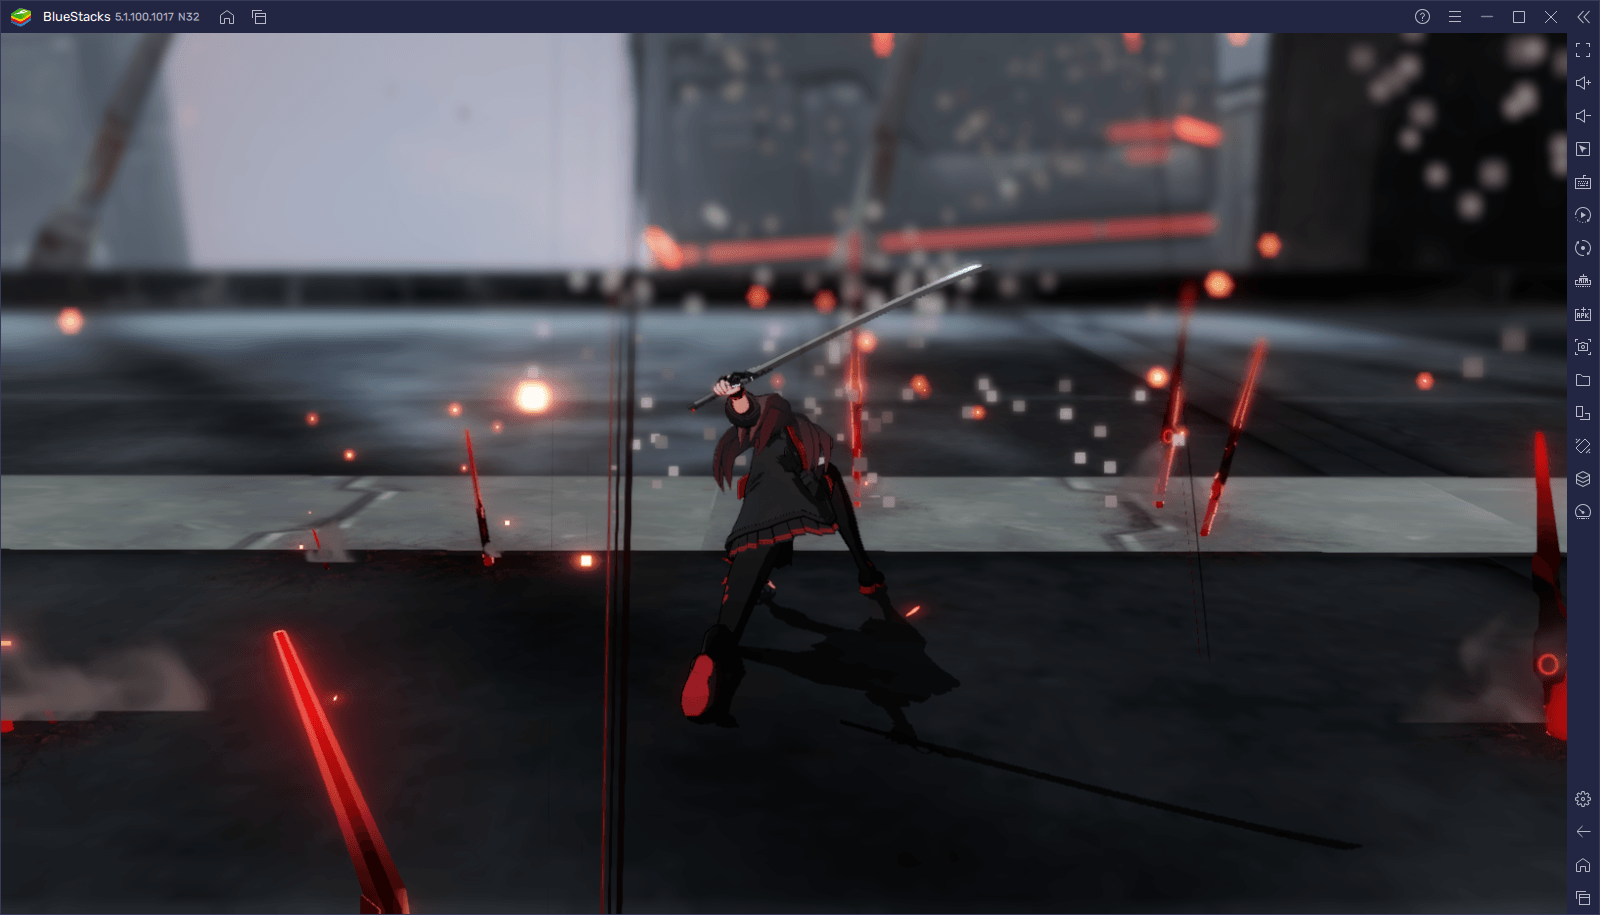 Punishing: Gray Raven – كيفية لعب لعبة PGR باستخدام لوحة الألعاب